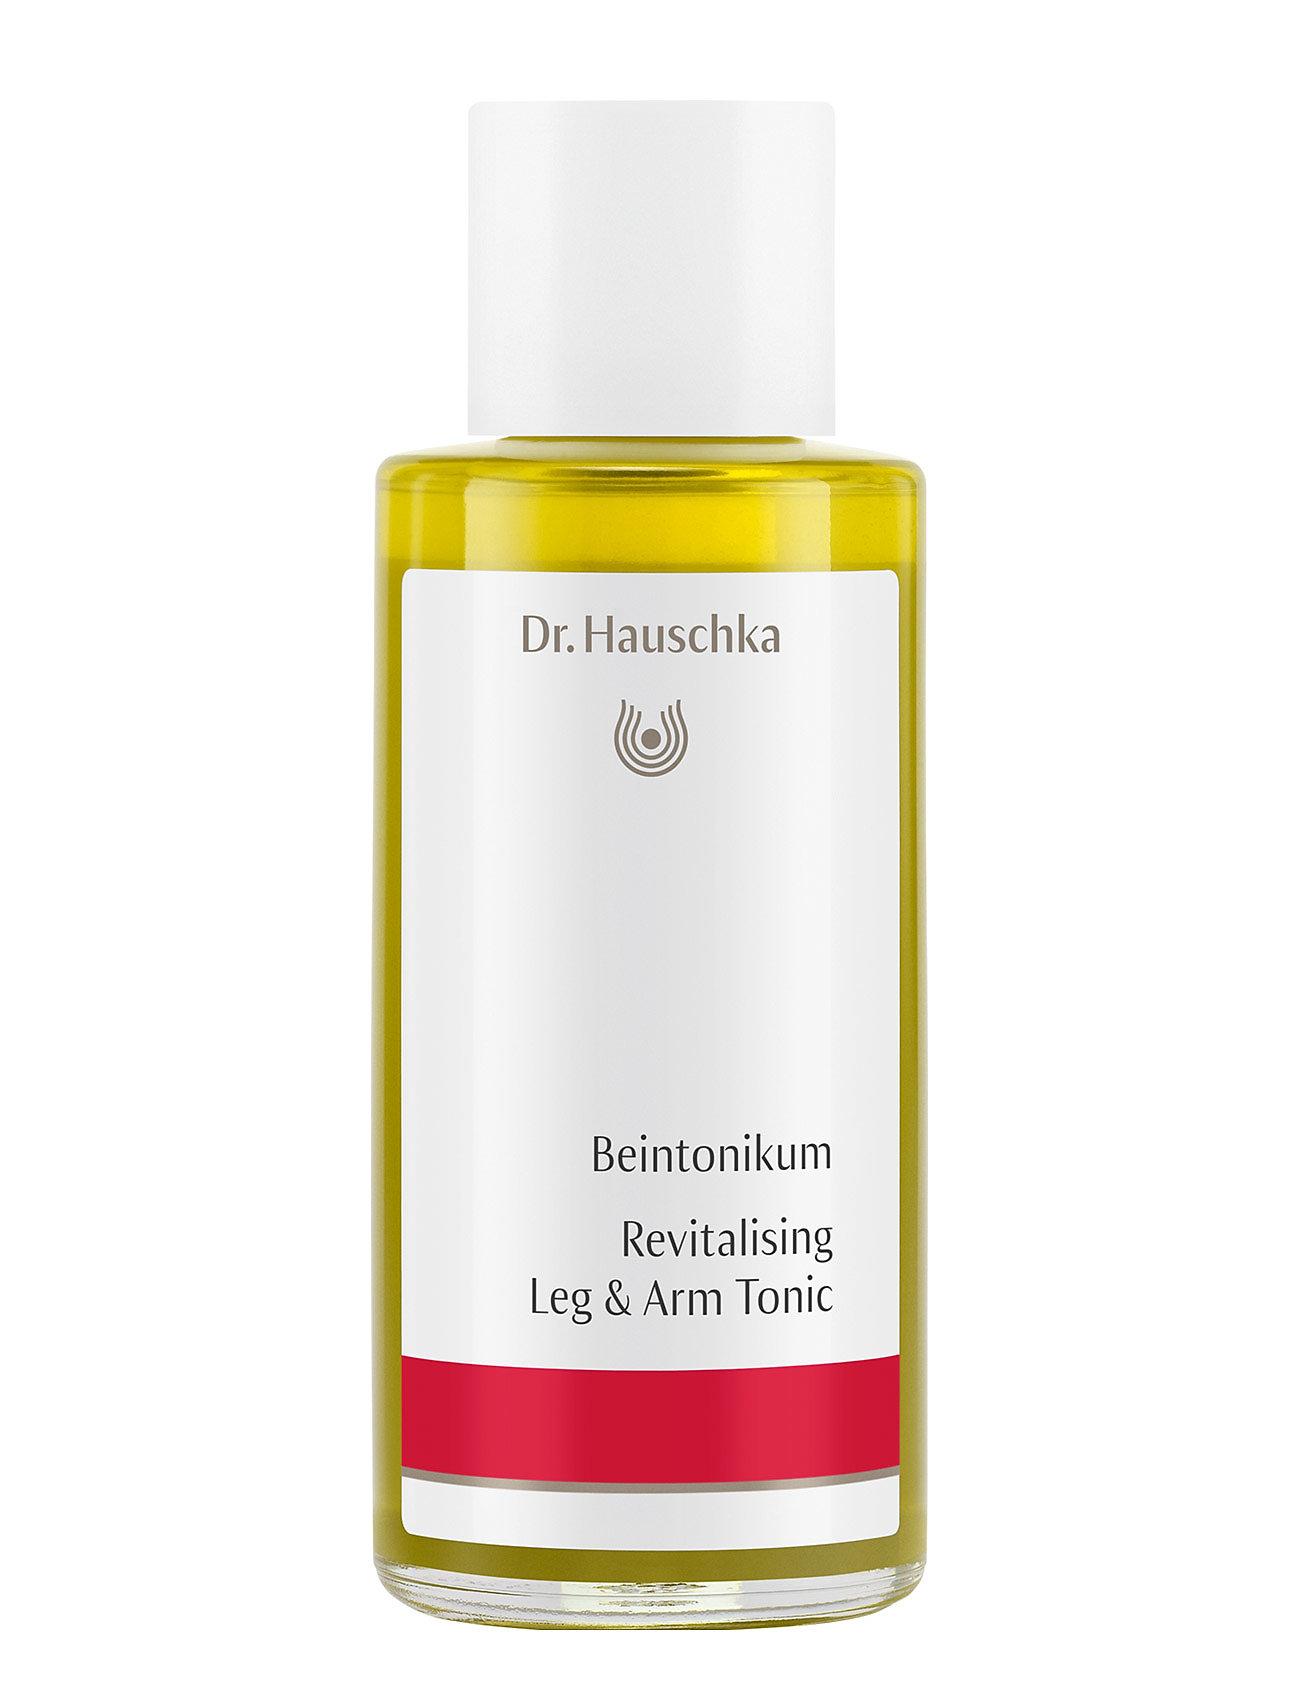 Dr. Hauschka - Revitalising Leg & Arm Tonic 100 ml